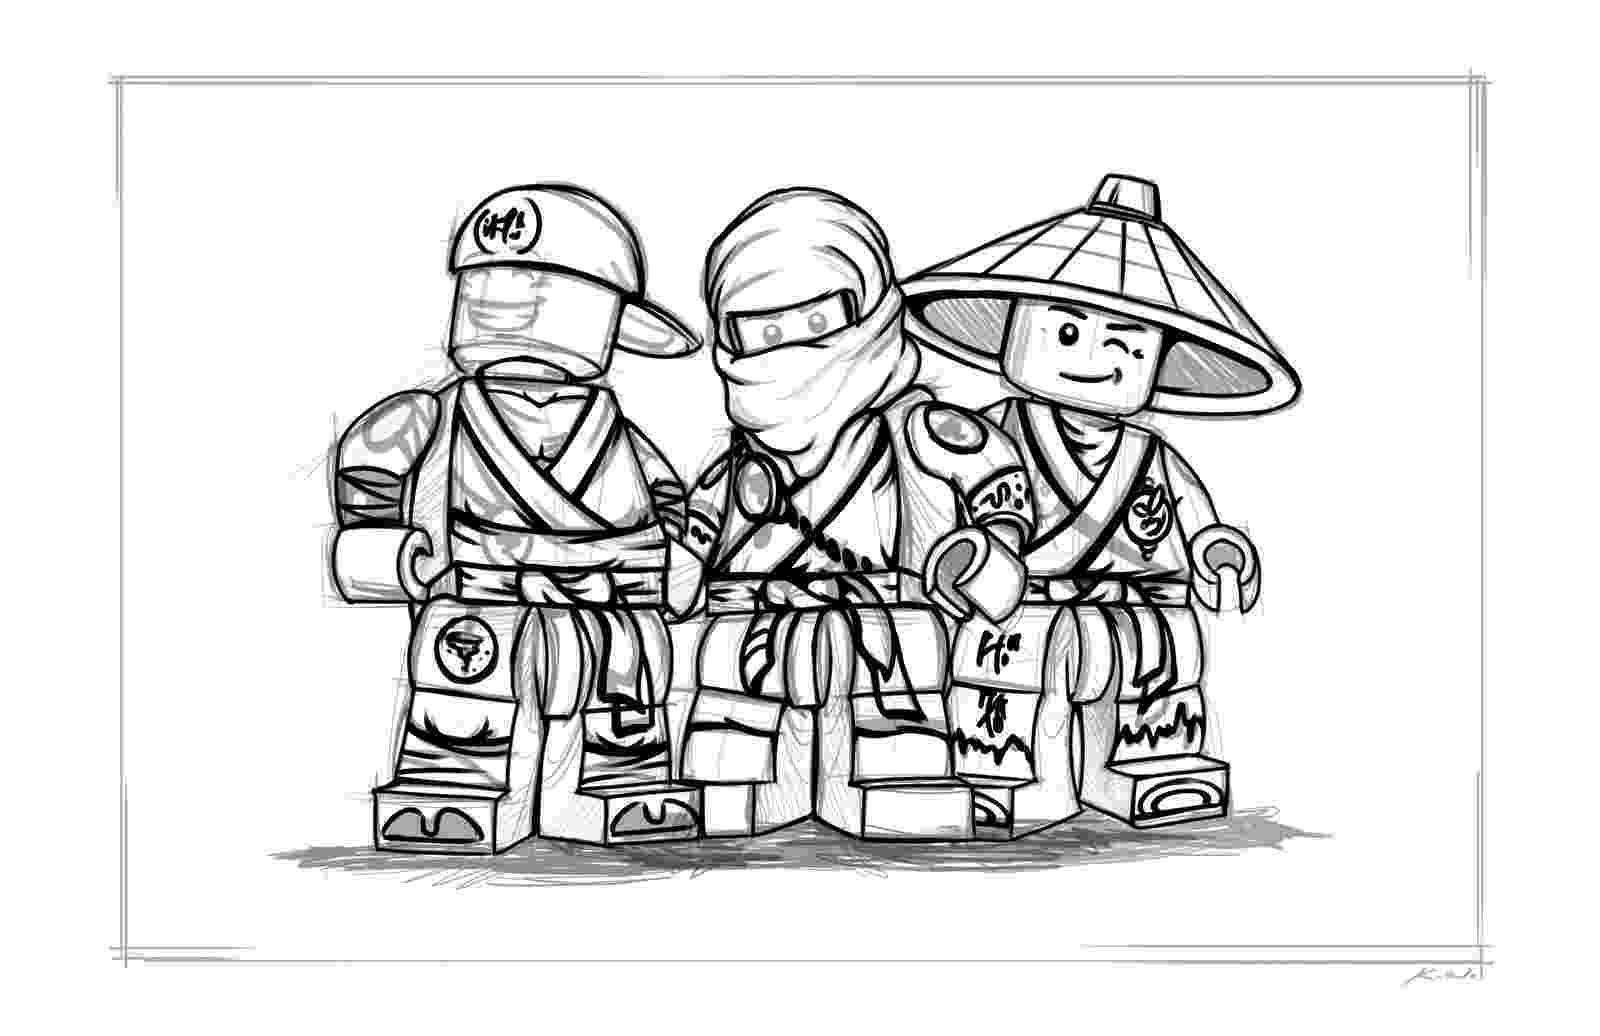 lego ninjago pictures lego ninjago coloring pages getcoloringpagescom lego ninjago pictures